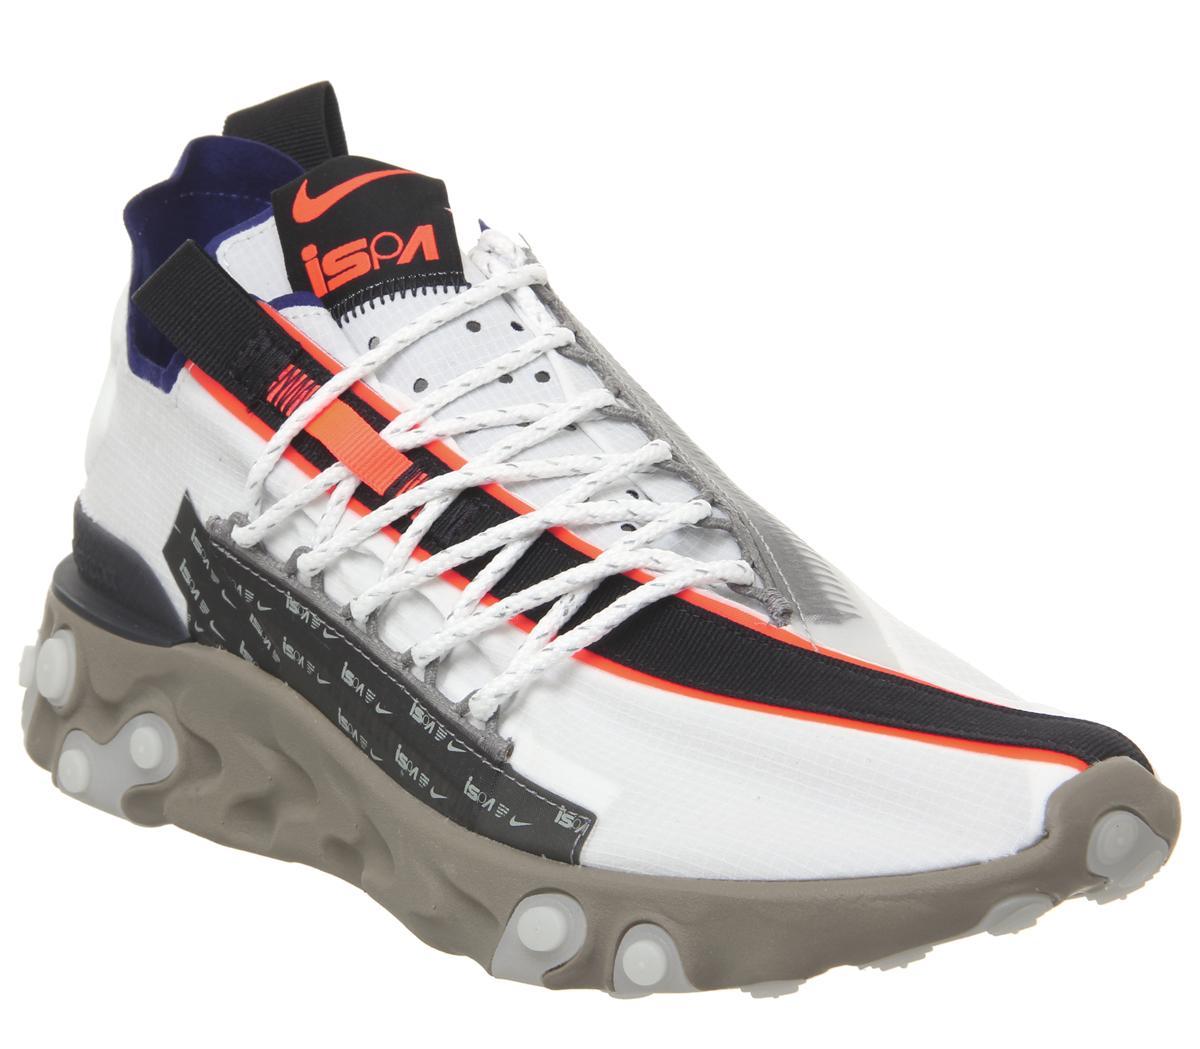 tímido Consistente infinito  Nike React Runner WR ISPA Trainers Summit White Deep Royal Khaki Black -  His trainers